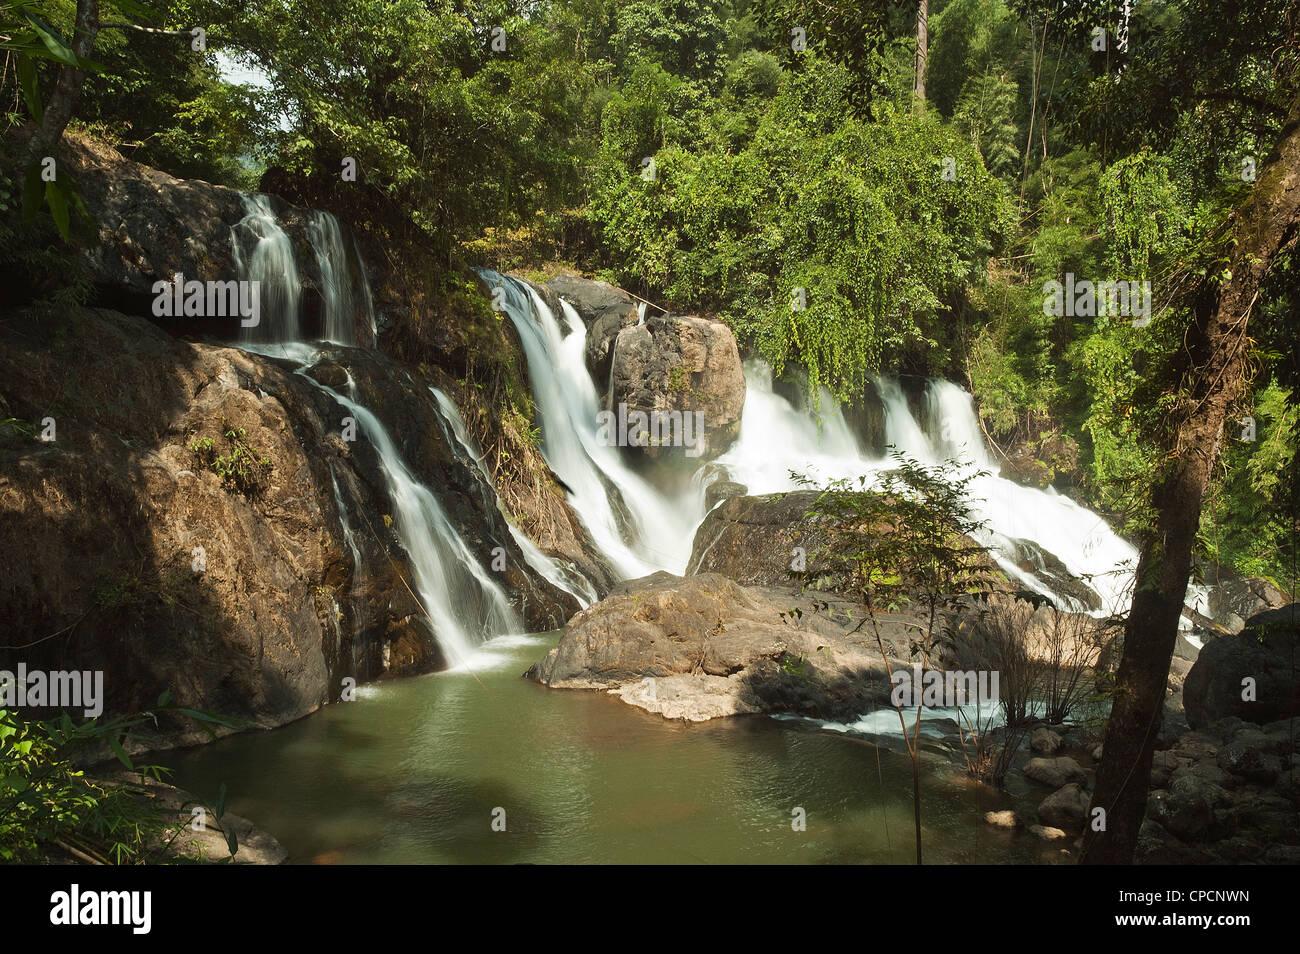 Elk208-3447 Thailand, Mae Hong Son area, Pha Sua Waterfall National Park, waterfall - Stock Image